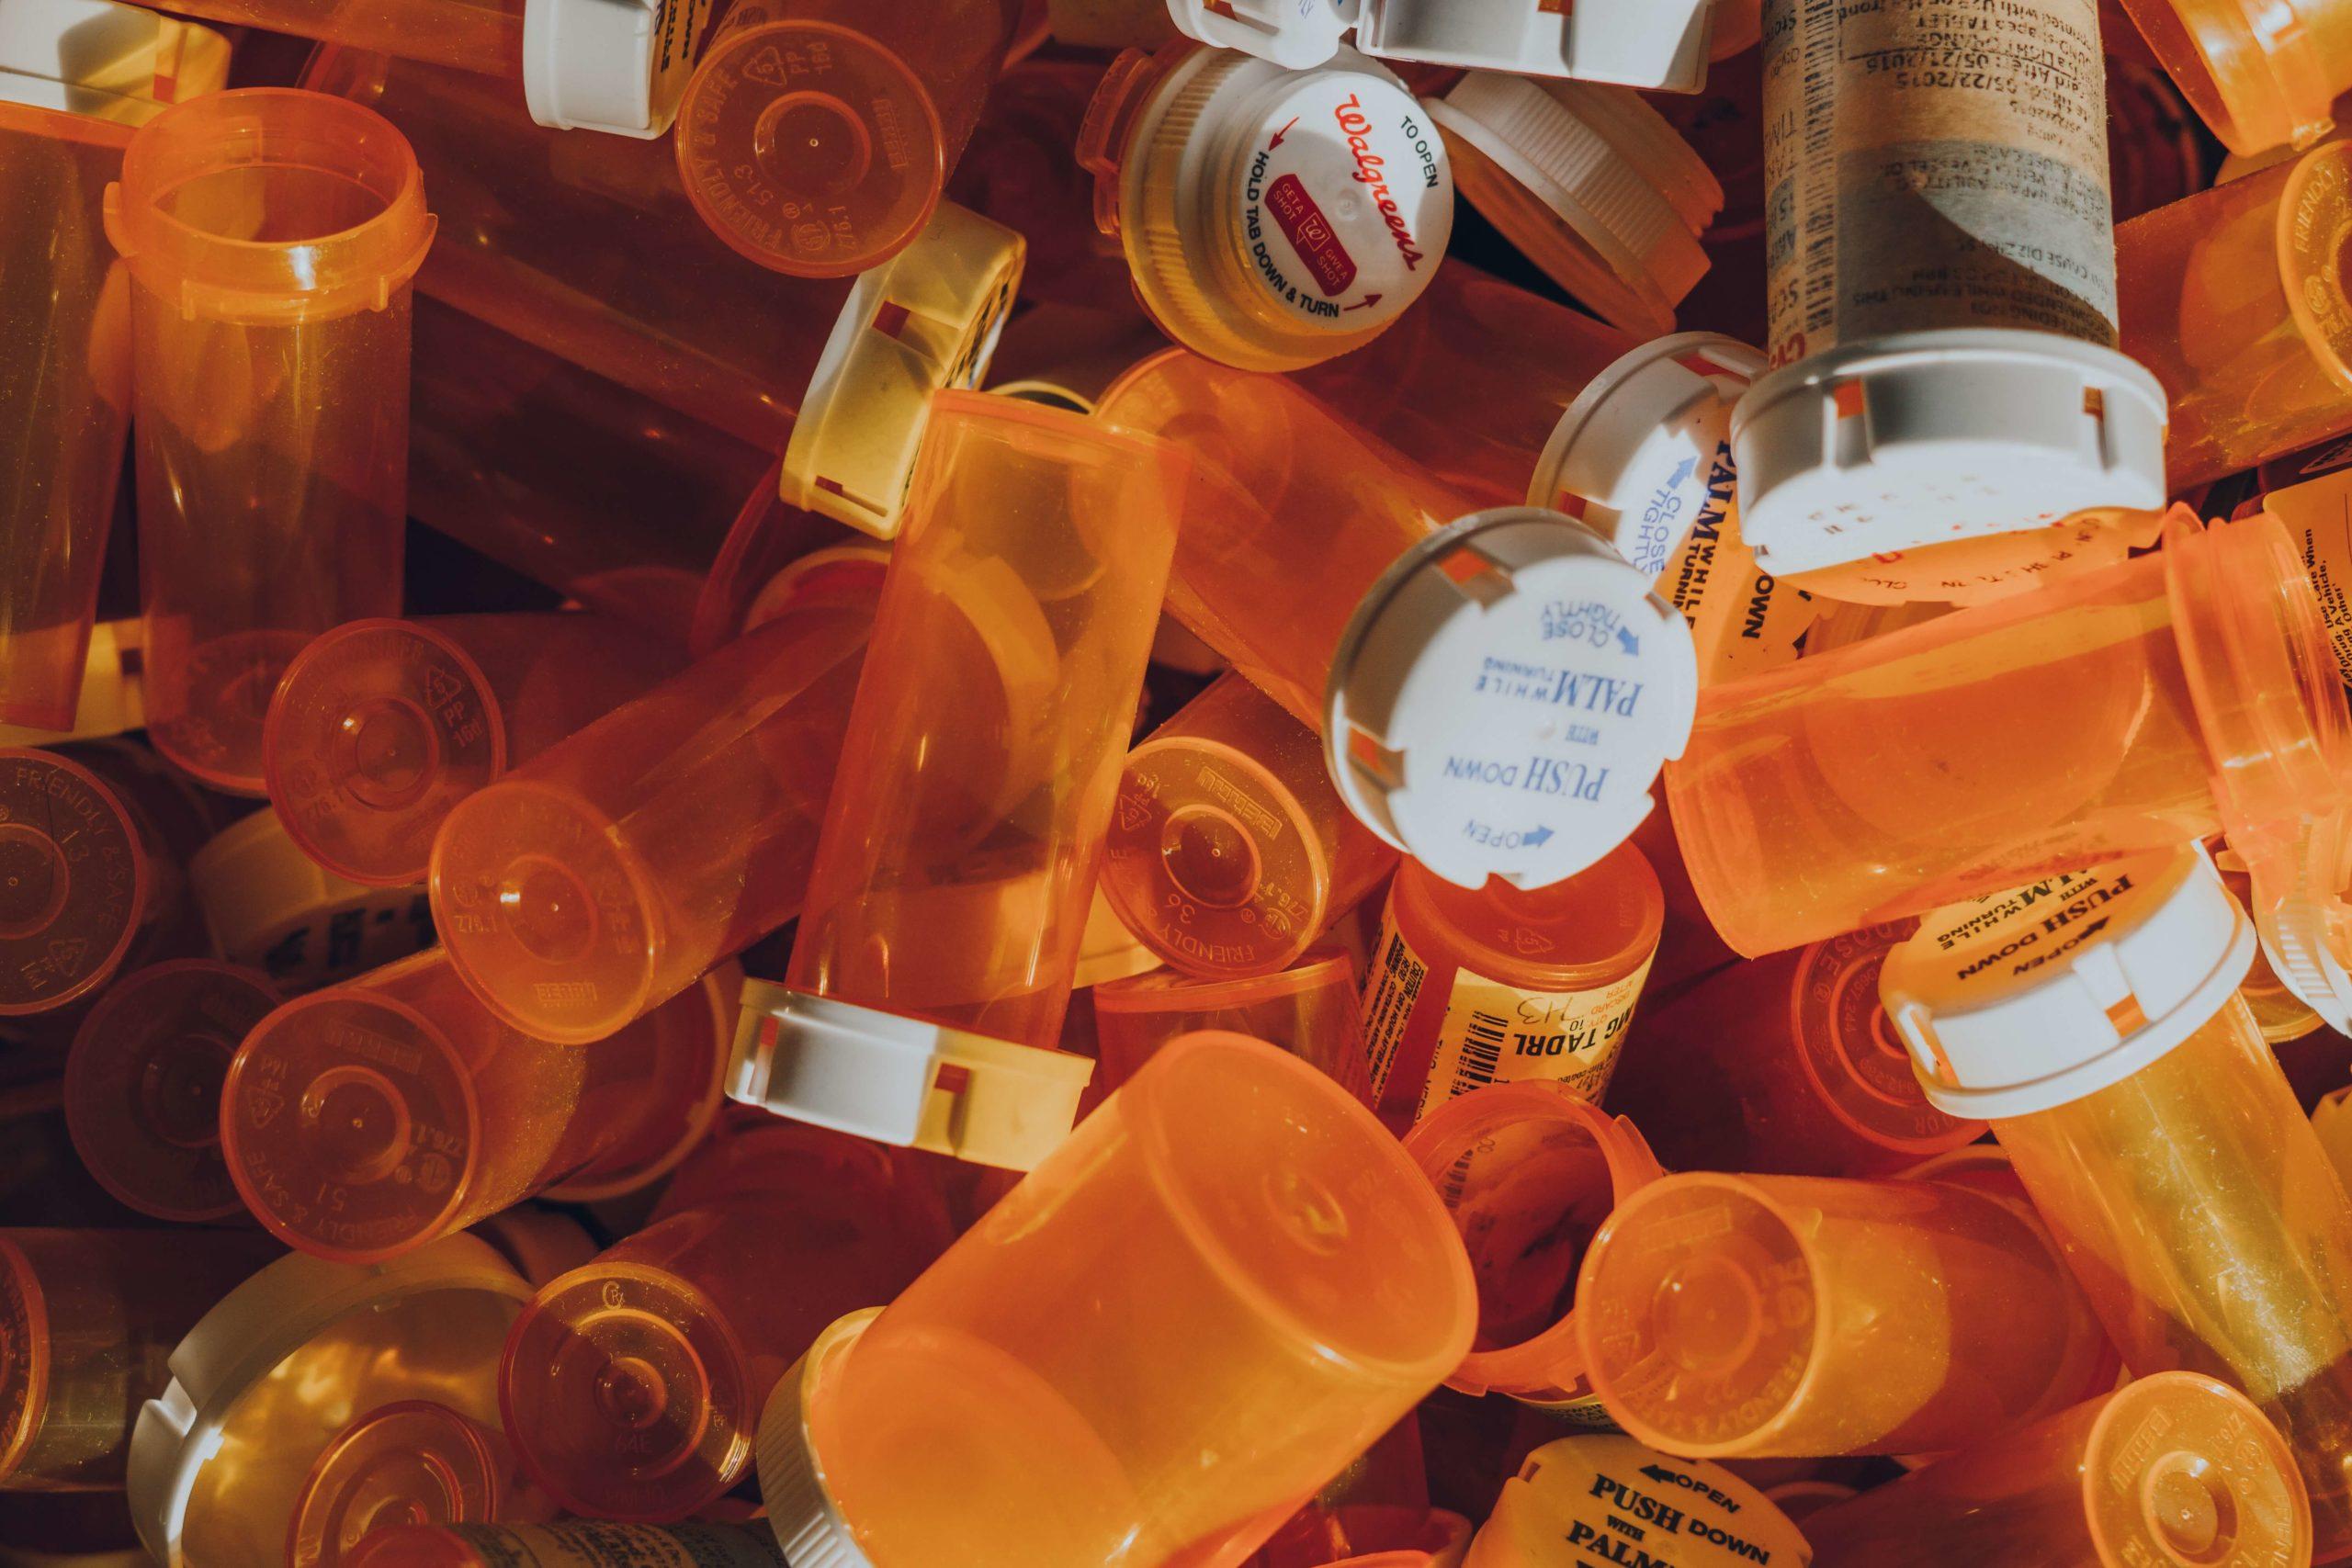 Empty orange medicine bottles